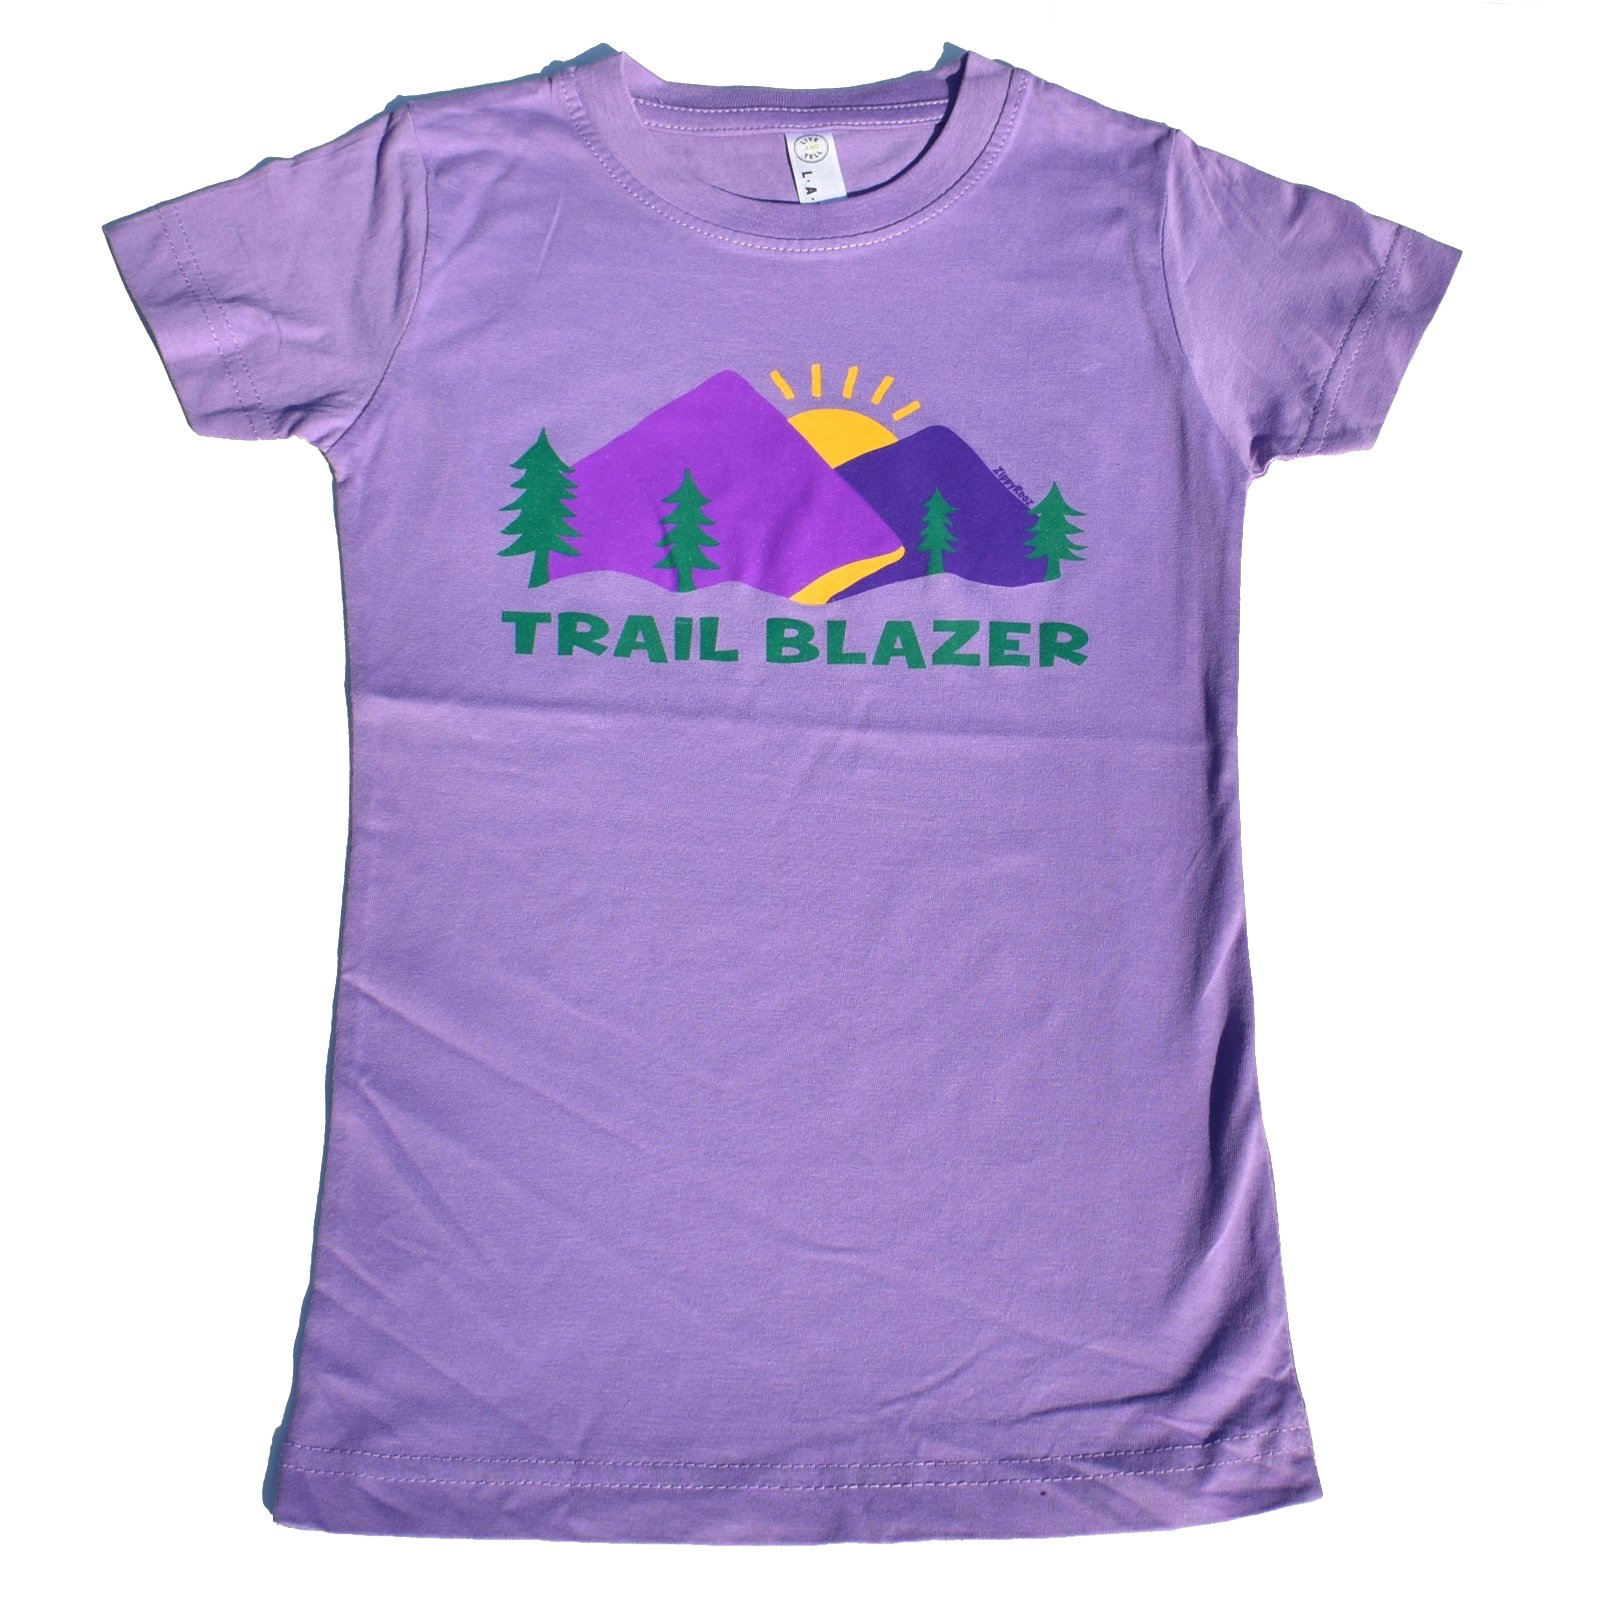 ZippyRooz Toddler & Kids Hiking Camping Tee Shirt Trail Blazer For Youth Girls (S (6-8))